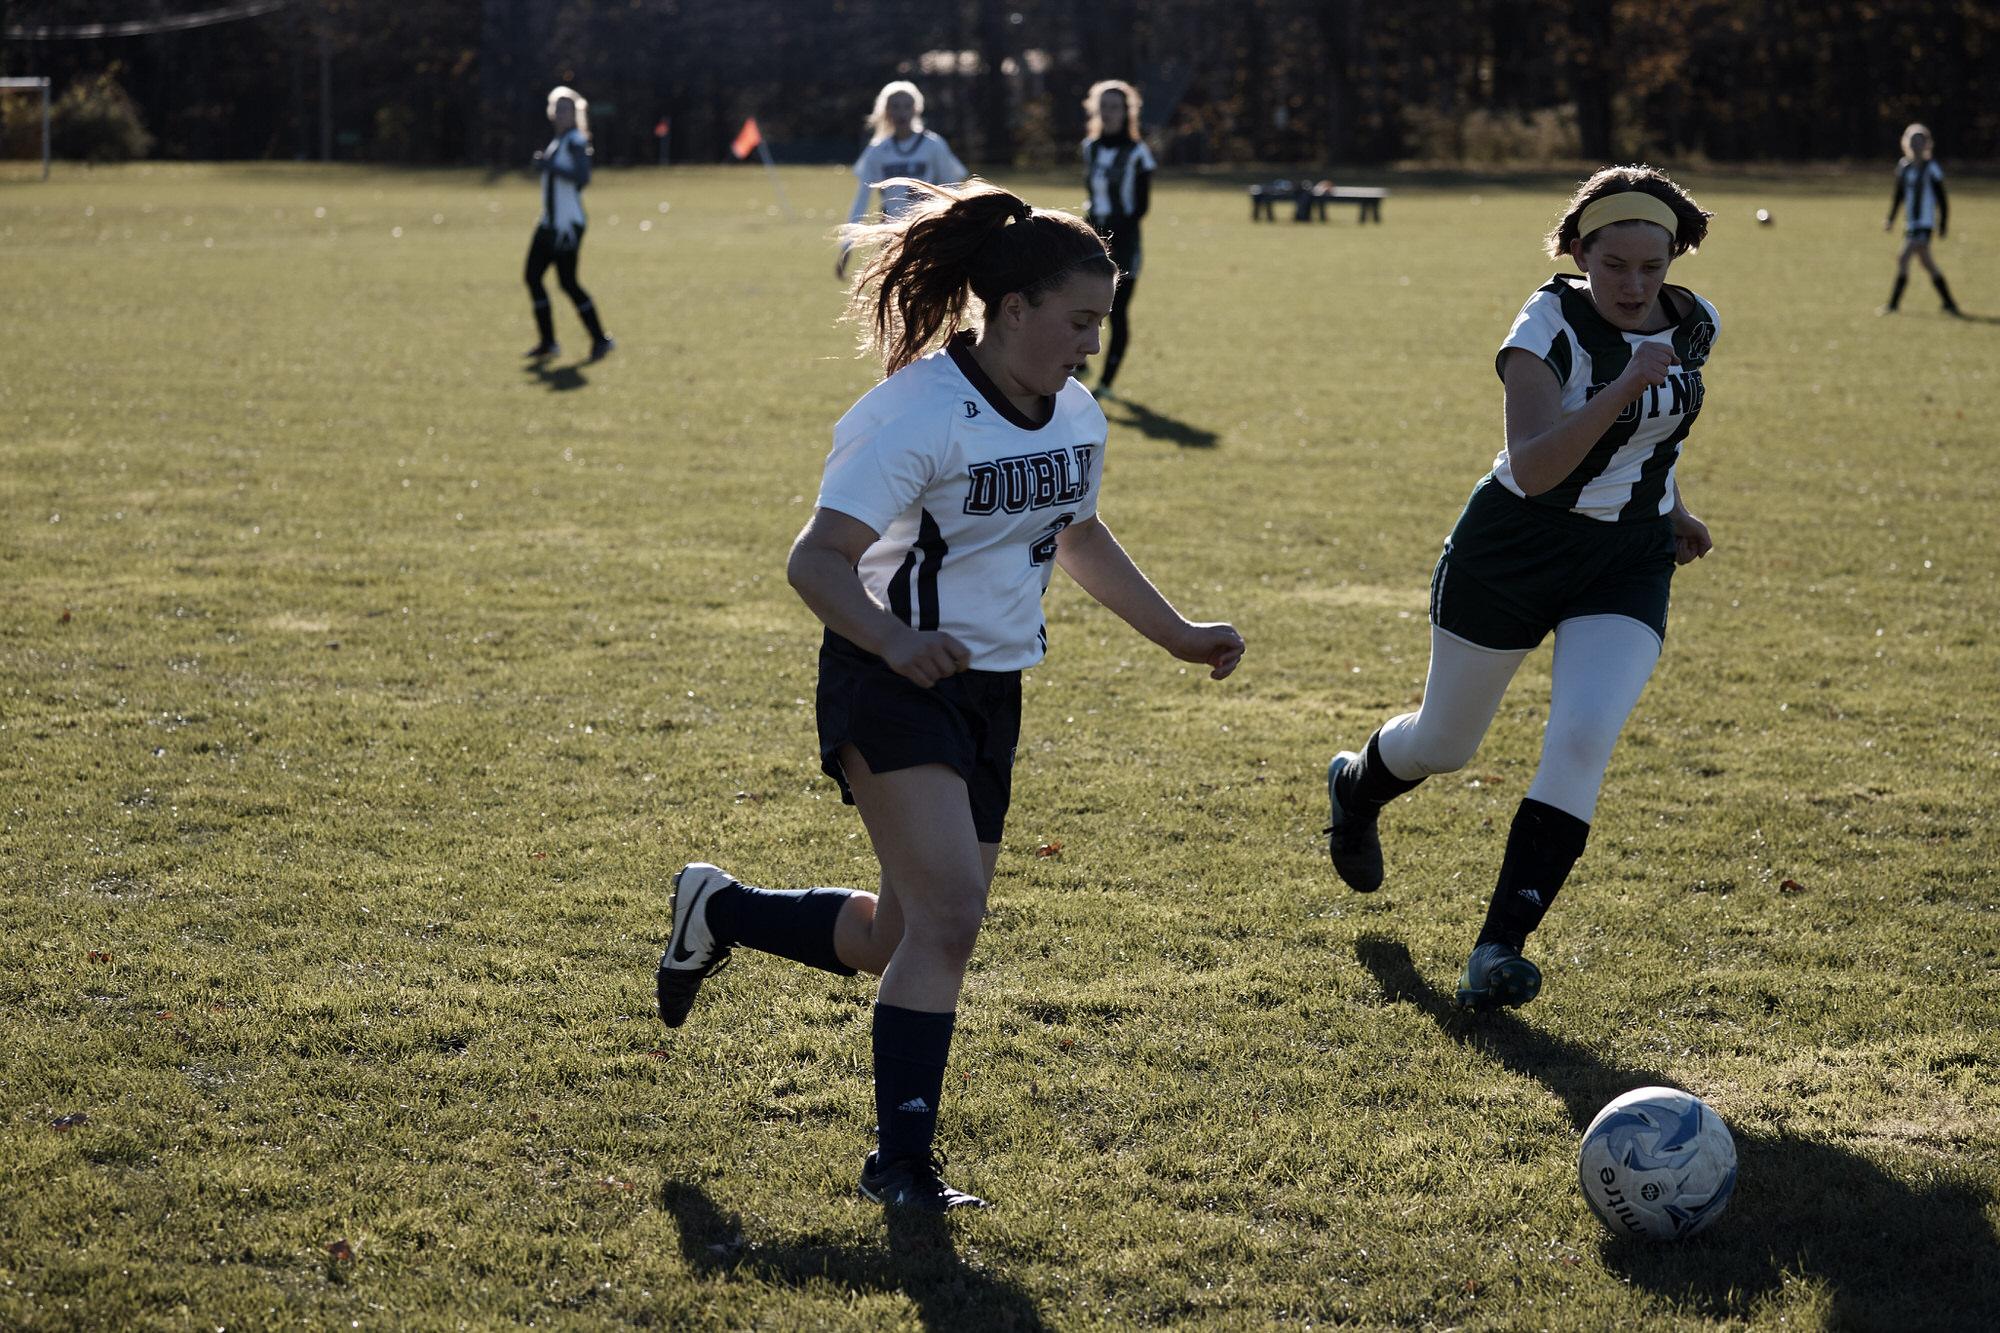 Girls Varsity Soccer vs. Putney School - October 26, 2018 - 027.jpg